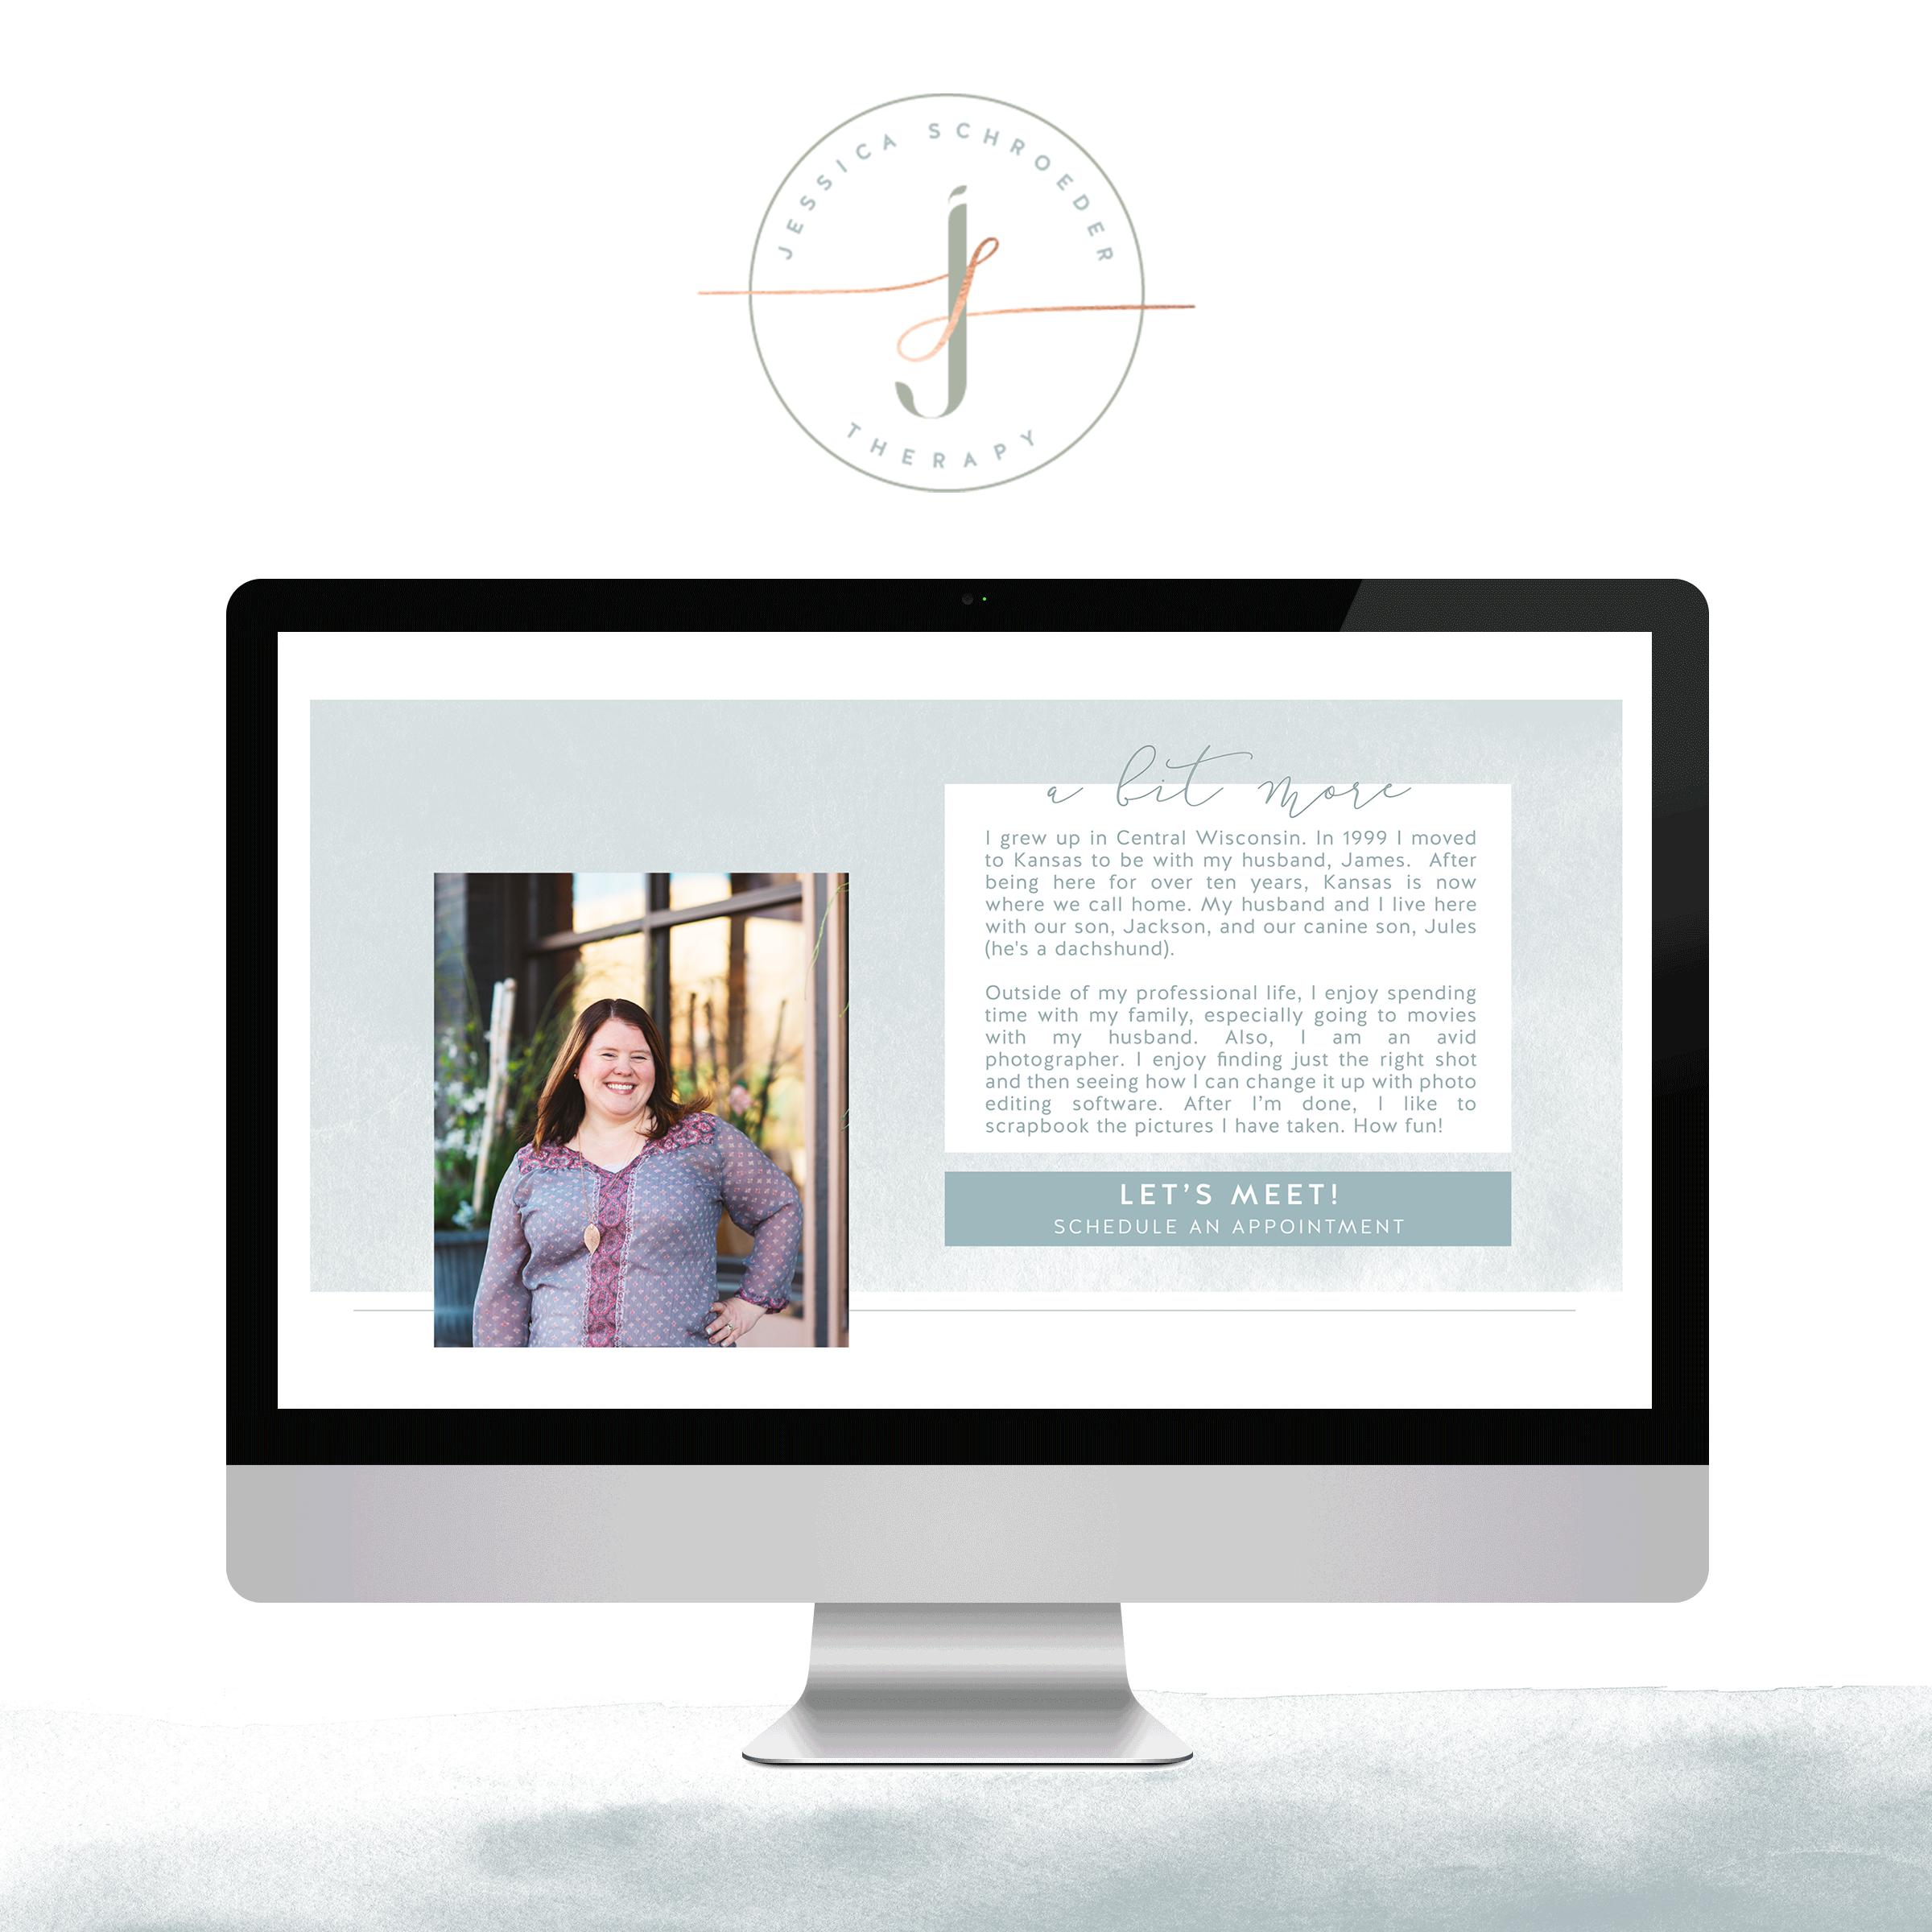 Jessica-Schroeder-Go-Live-5-web-design.png